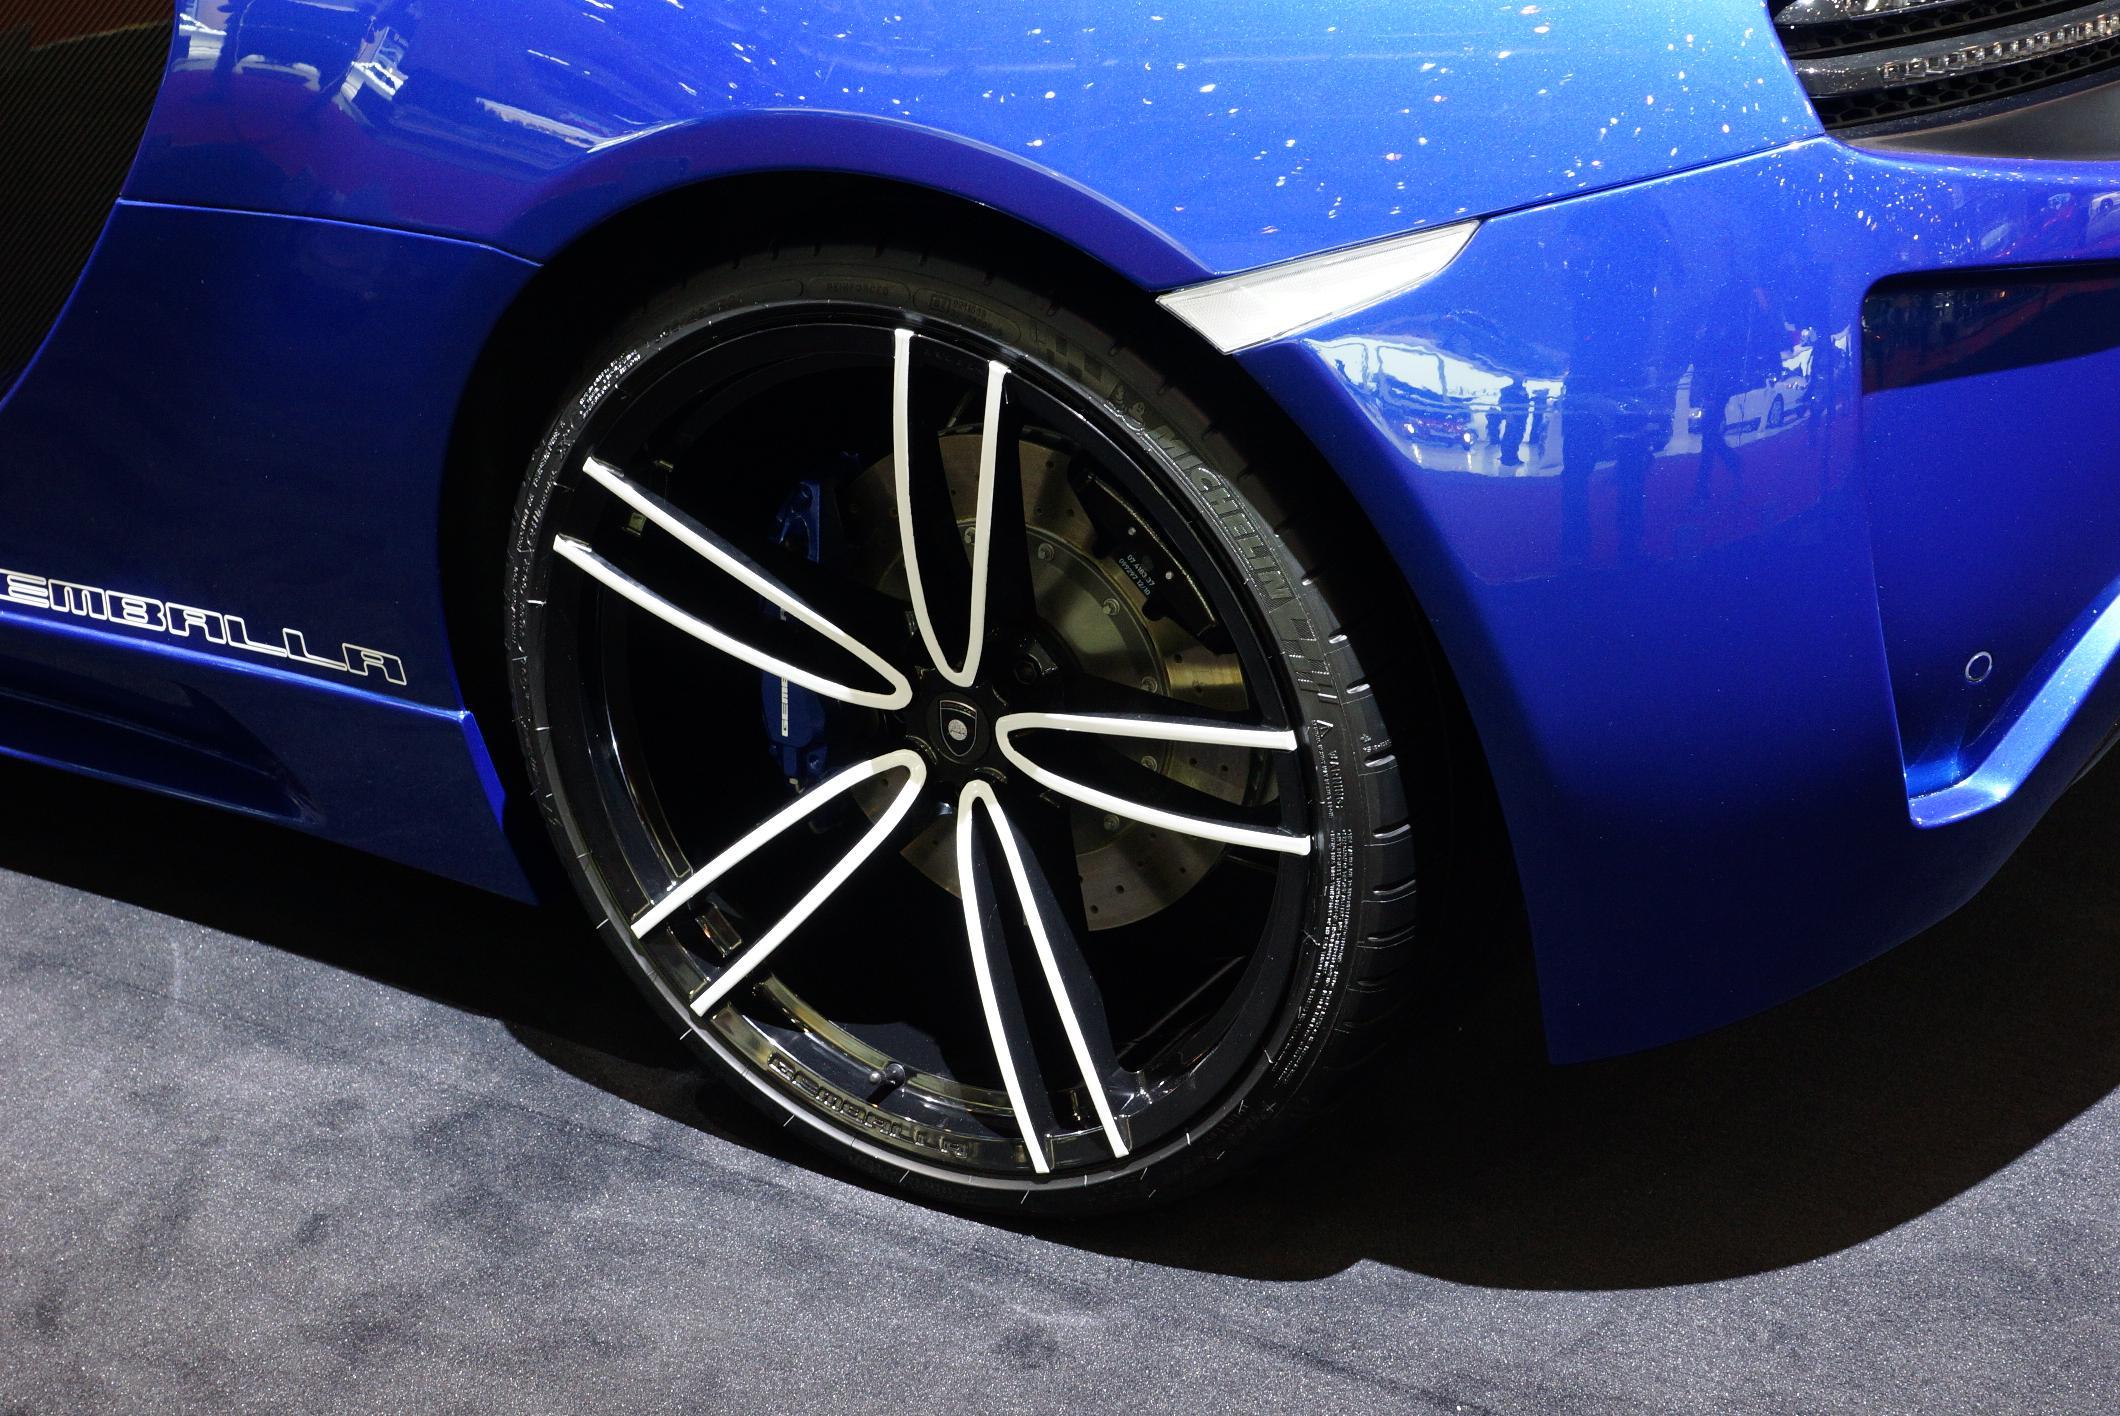 Gemballa GT McLaren MP4-12C Geneva 2012 Wheel